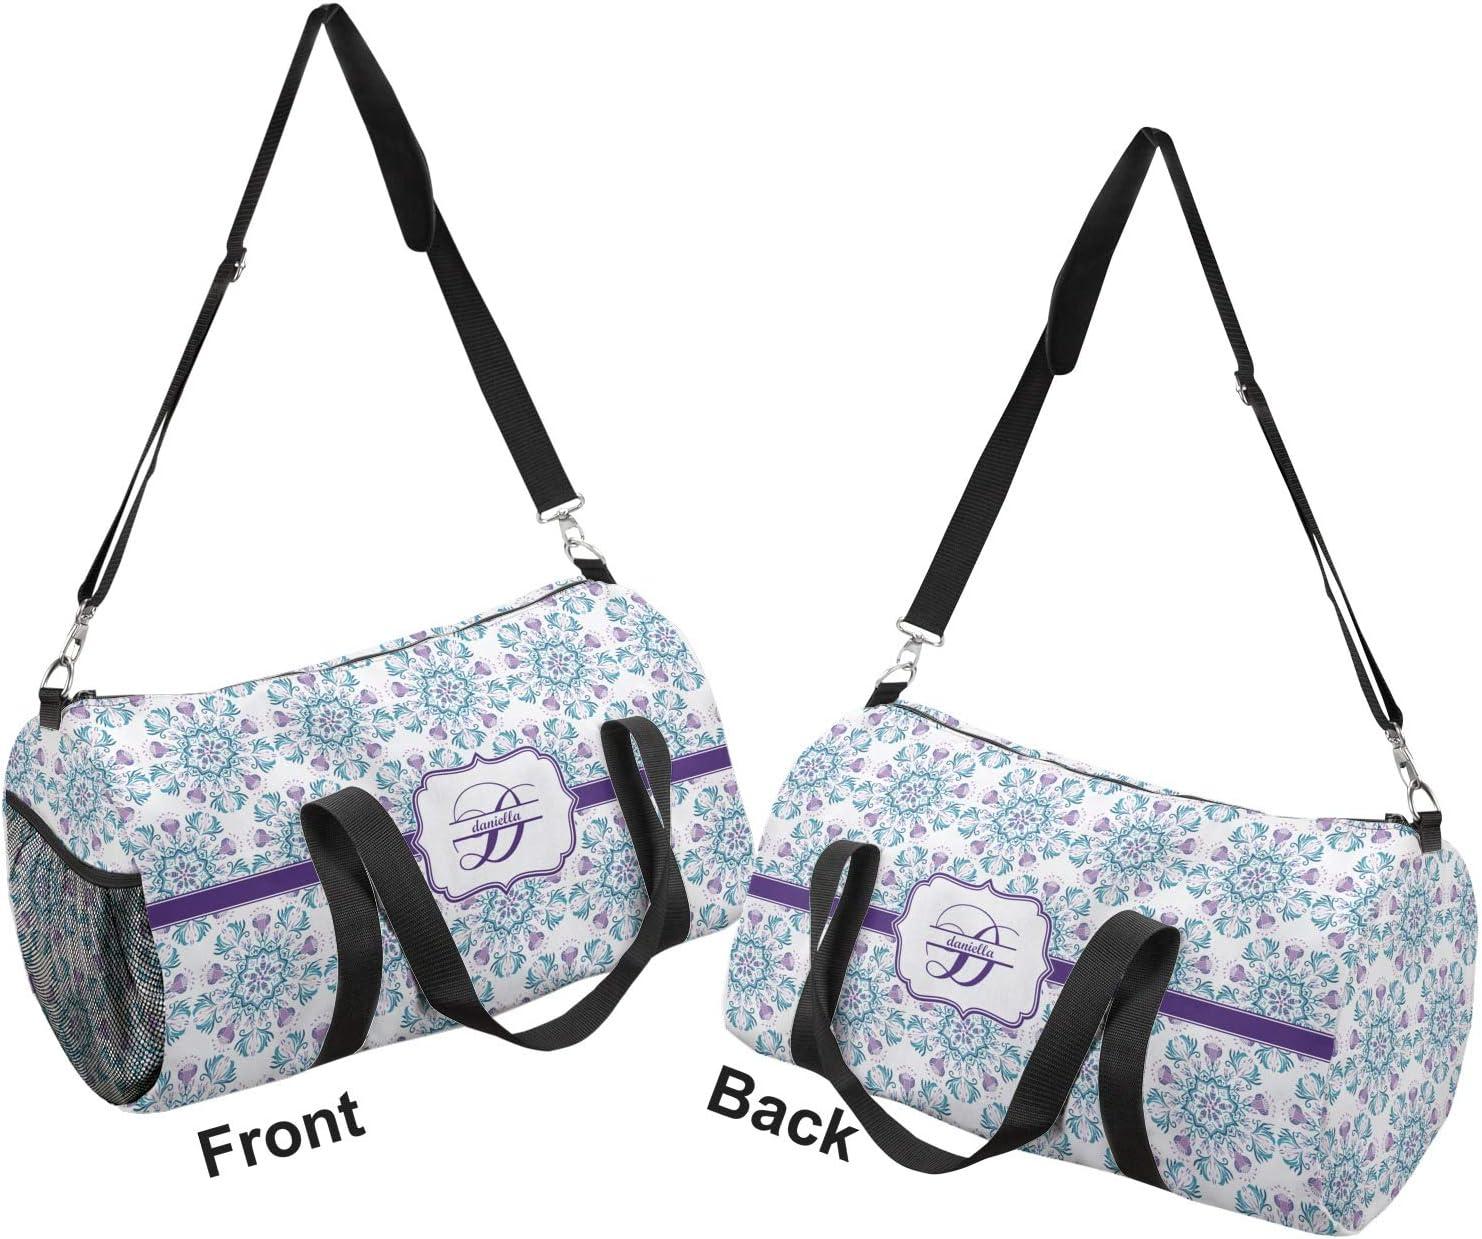 YouCustomizeIt Mandala Floral Duffel Bag Personalized